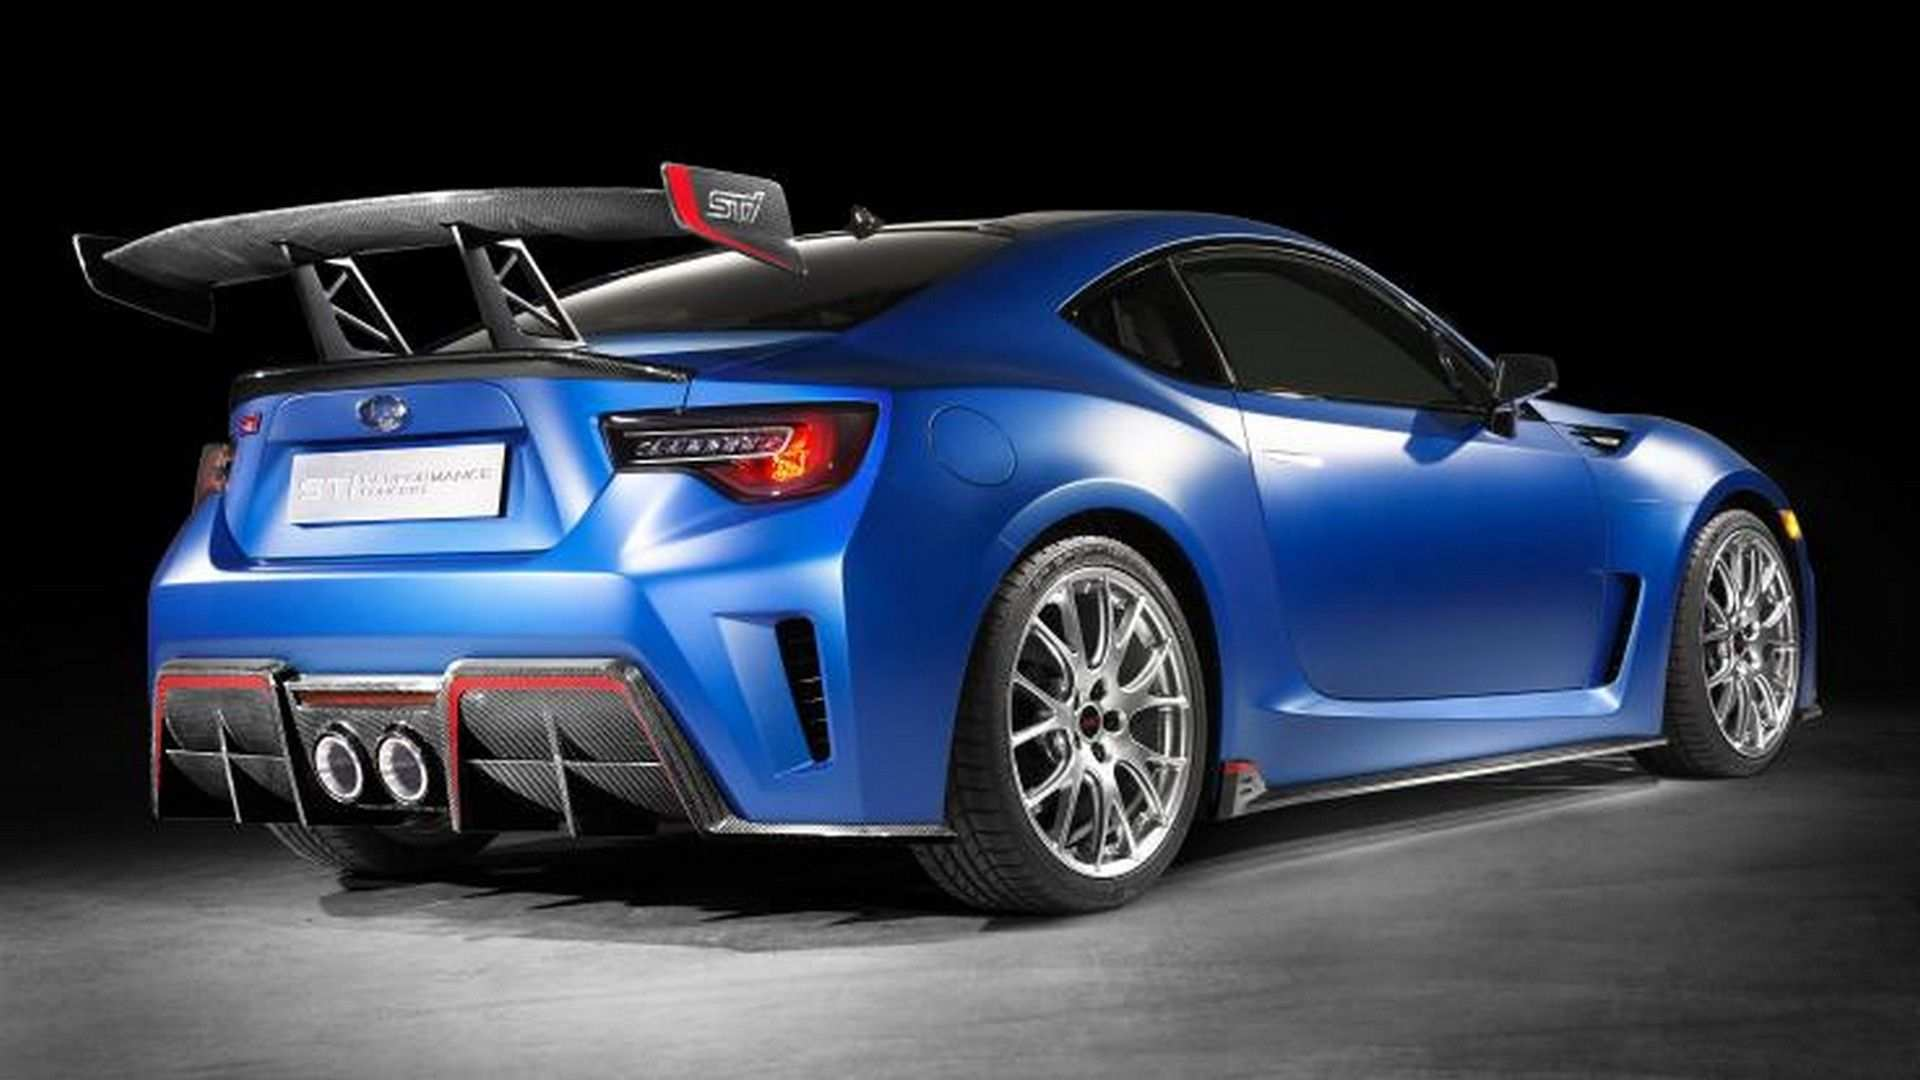 36 Concept of 2020 Subaru Brz Turbo Pictures by 2020 Subaru Brz Turbo